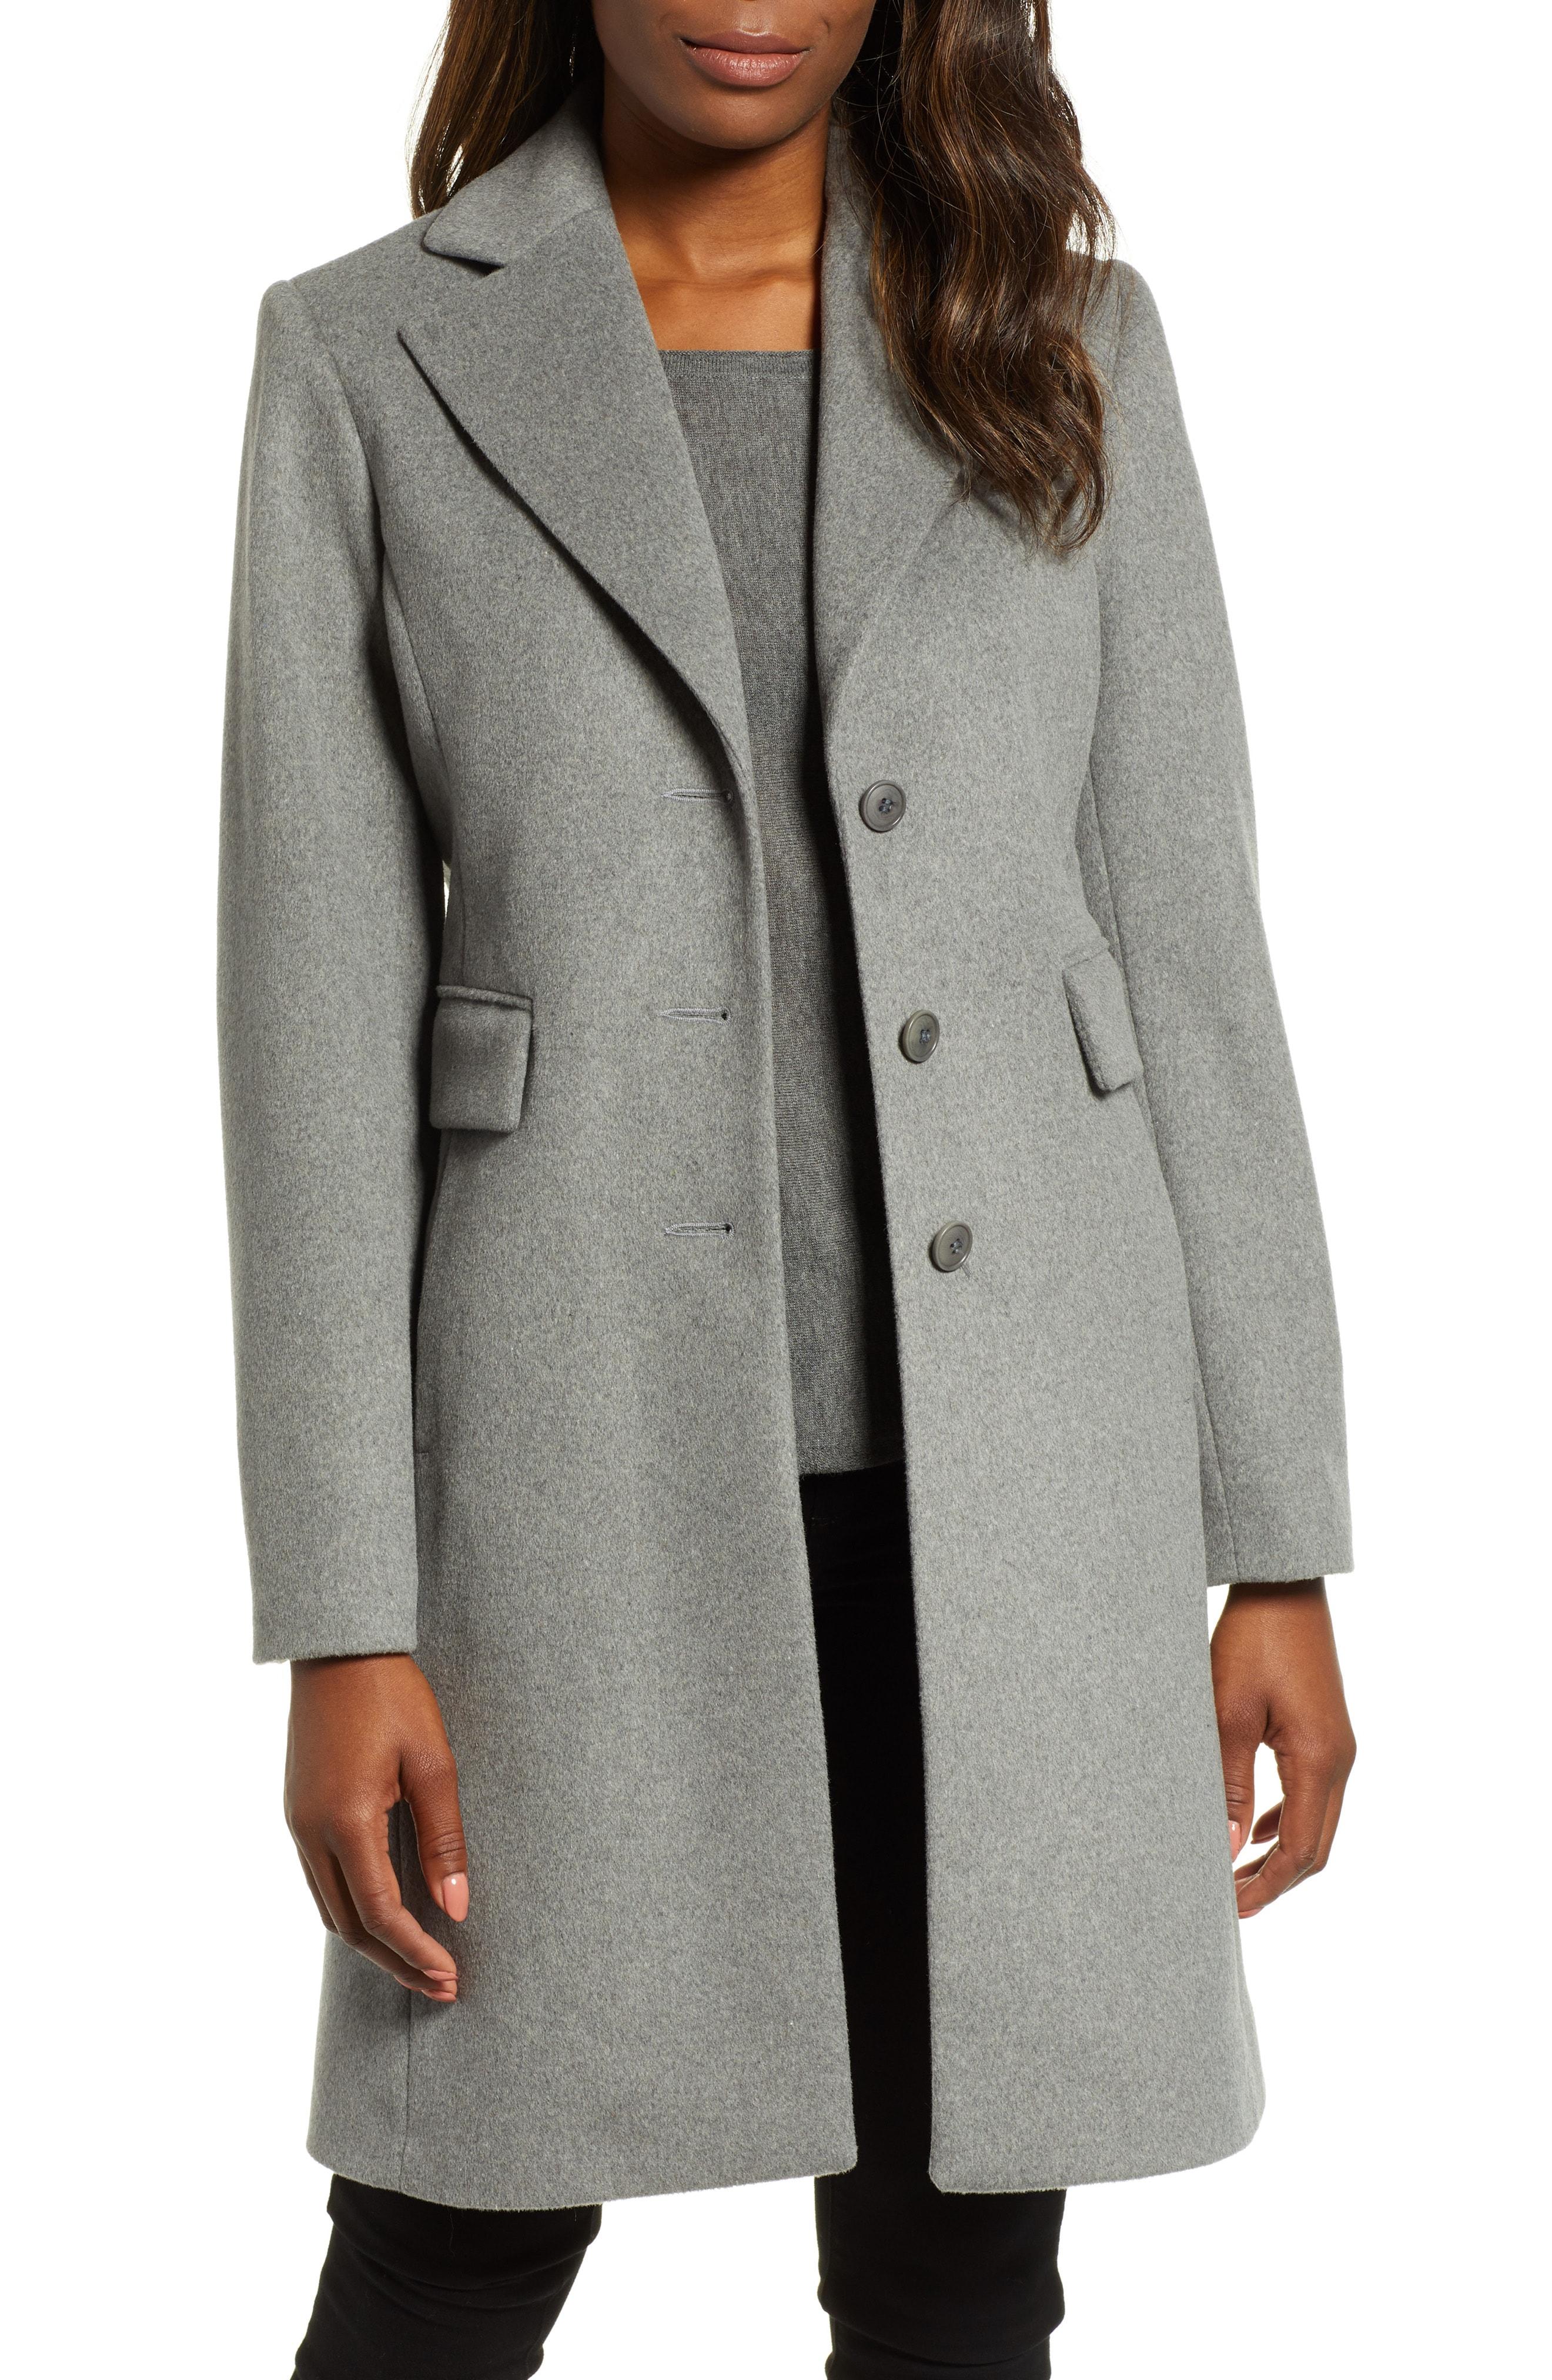 Stylish and elegant wool coats for women